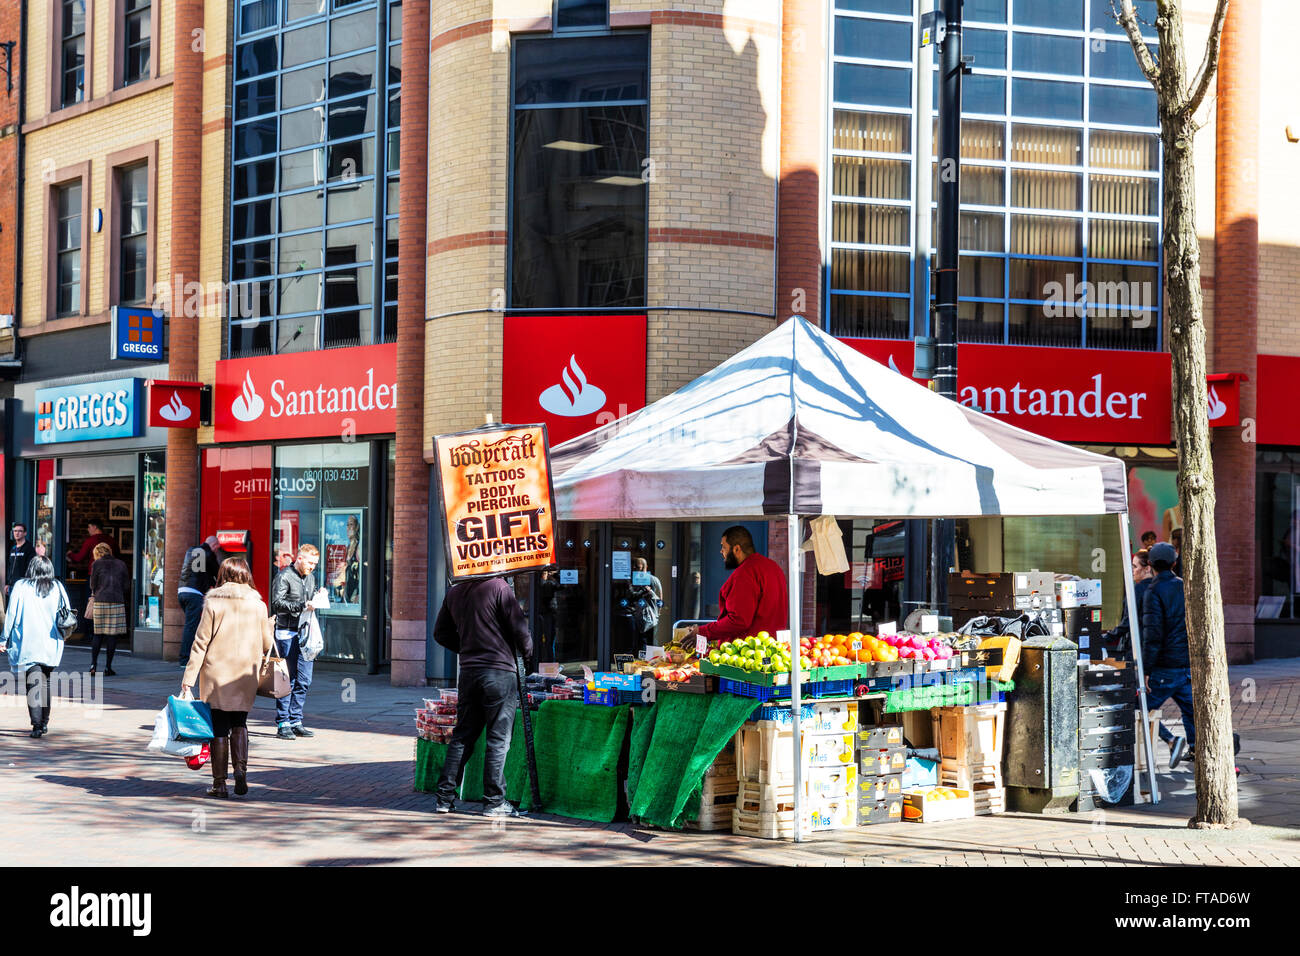 Man with placard advertising board advert for tattoos Nottingham City UK England GB Nottinhamshire - Stock Image